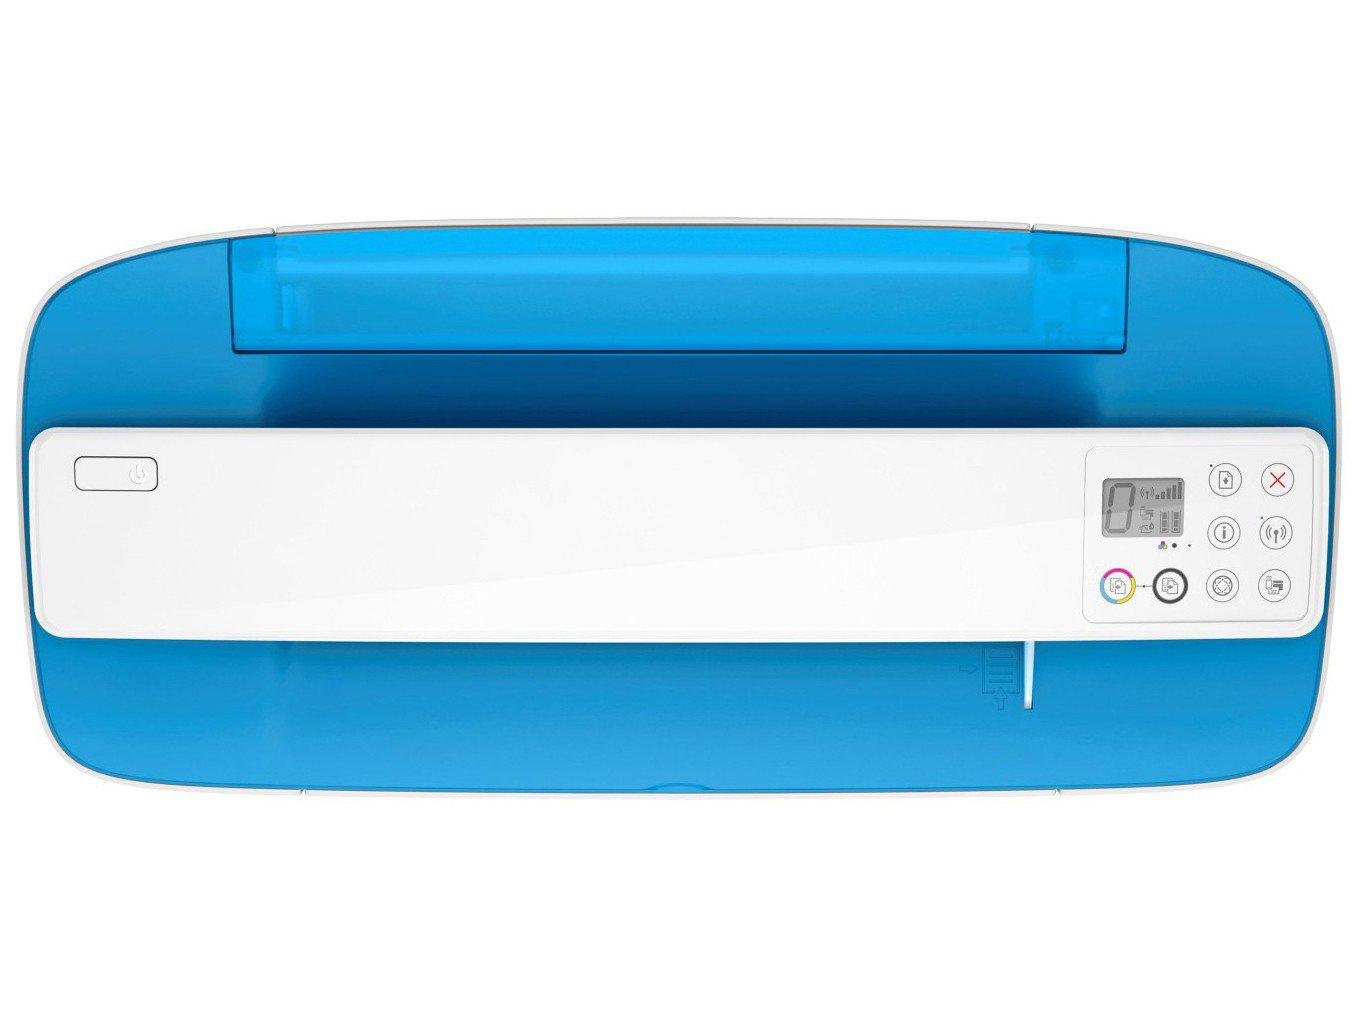 Foto 11 - Impressora Multifuncional HP - DeskJet Ink Advantage 3776 Jato de Tinta Wi-Fi